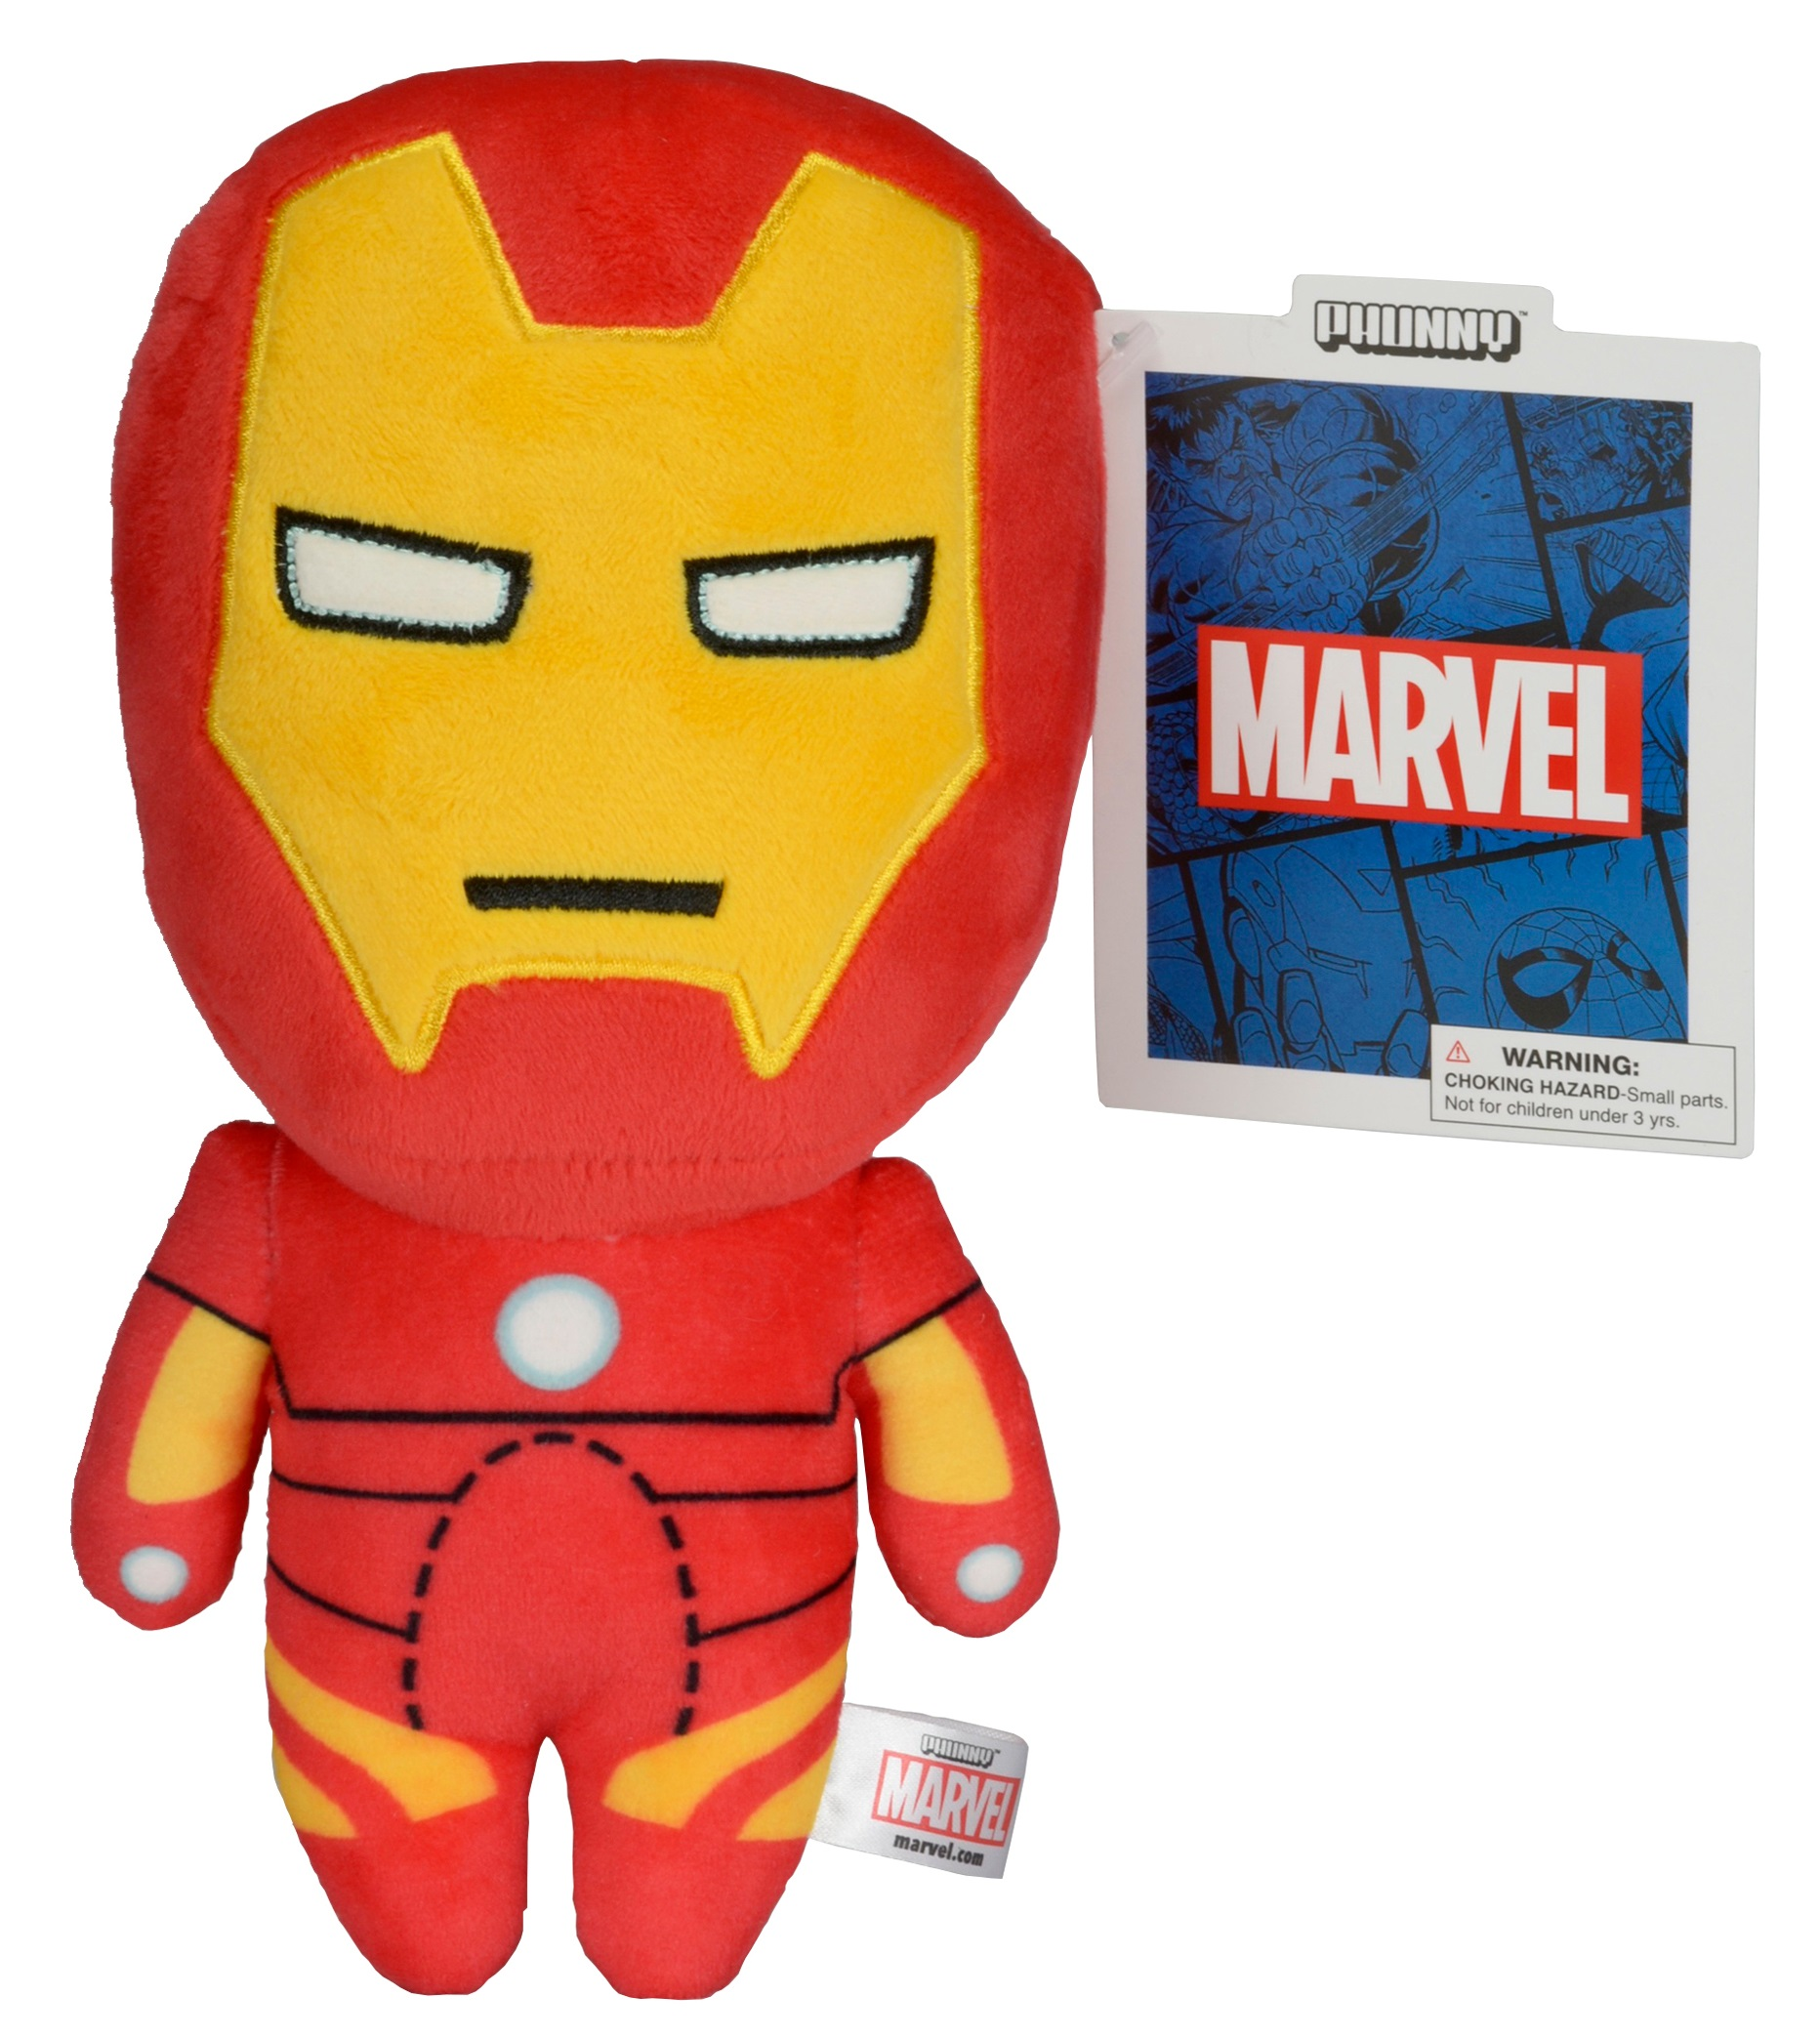 Фото Мягкая игрушка Marvel Phunnys. Iron Man (20 см) marvel phunny s мягкая игрушка iron man